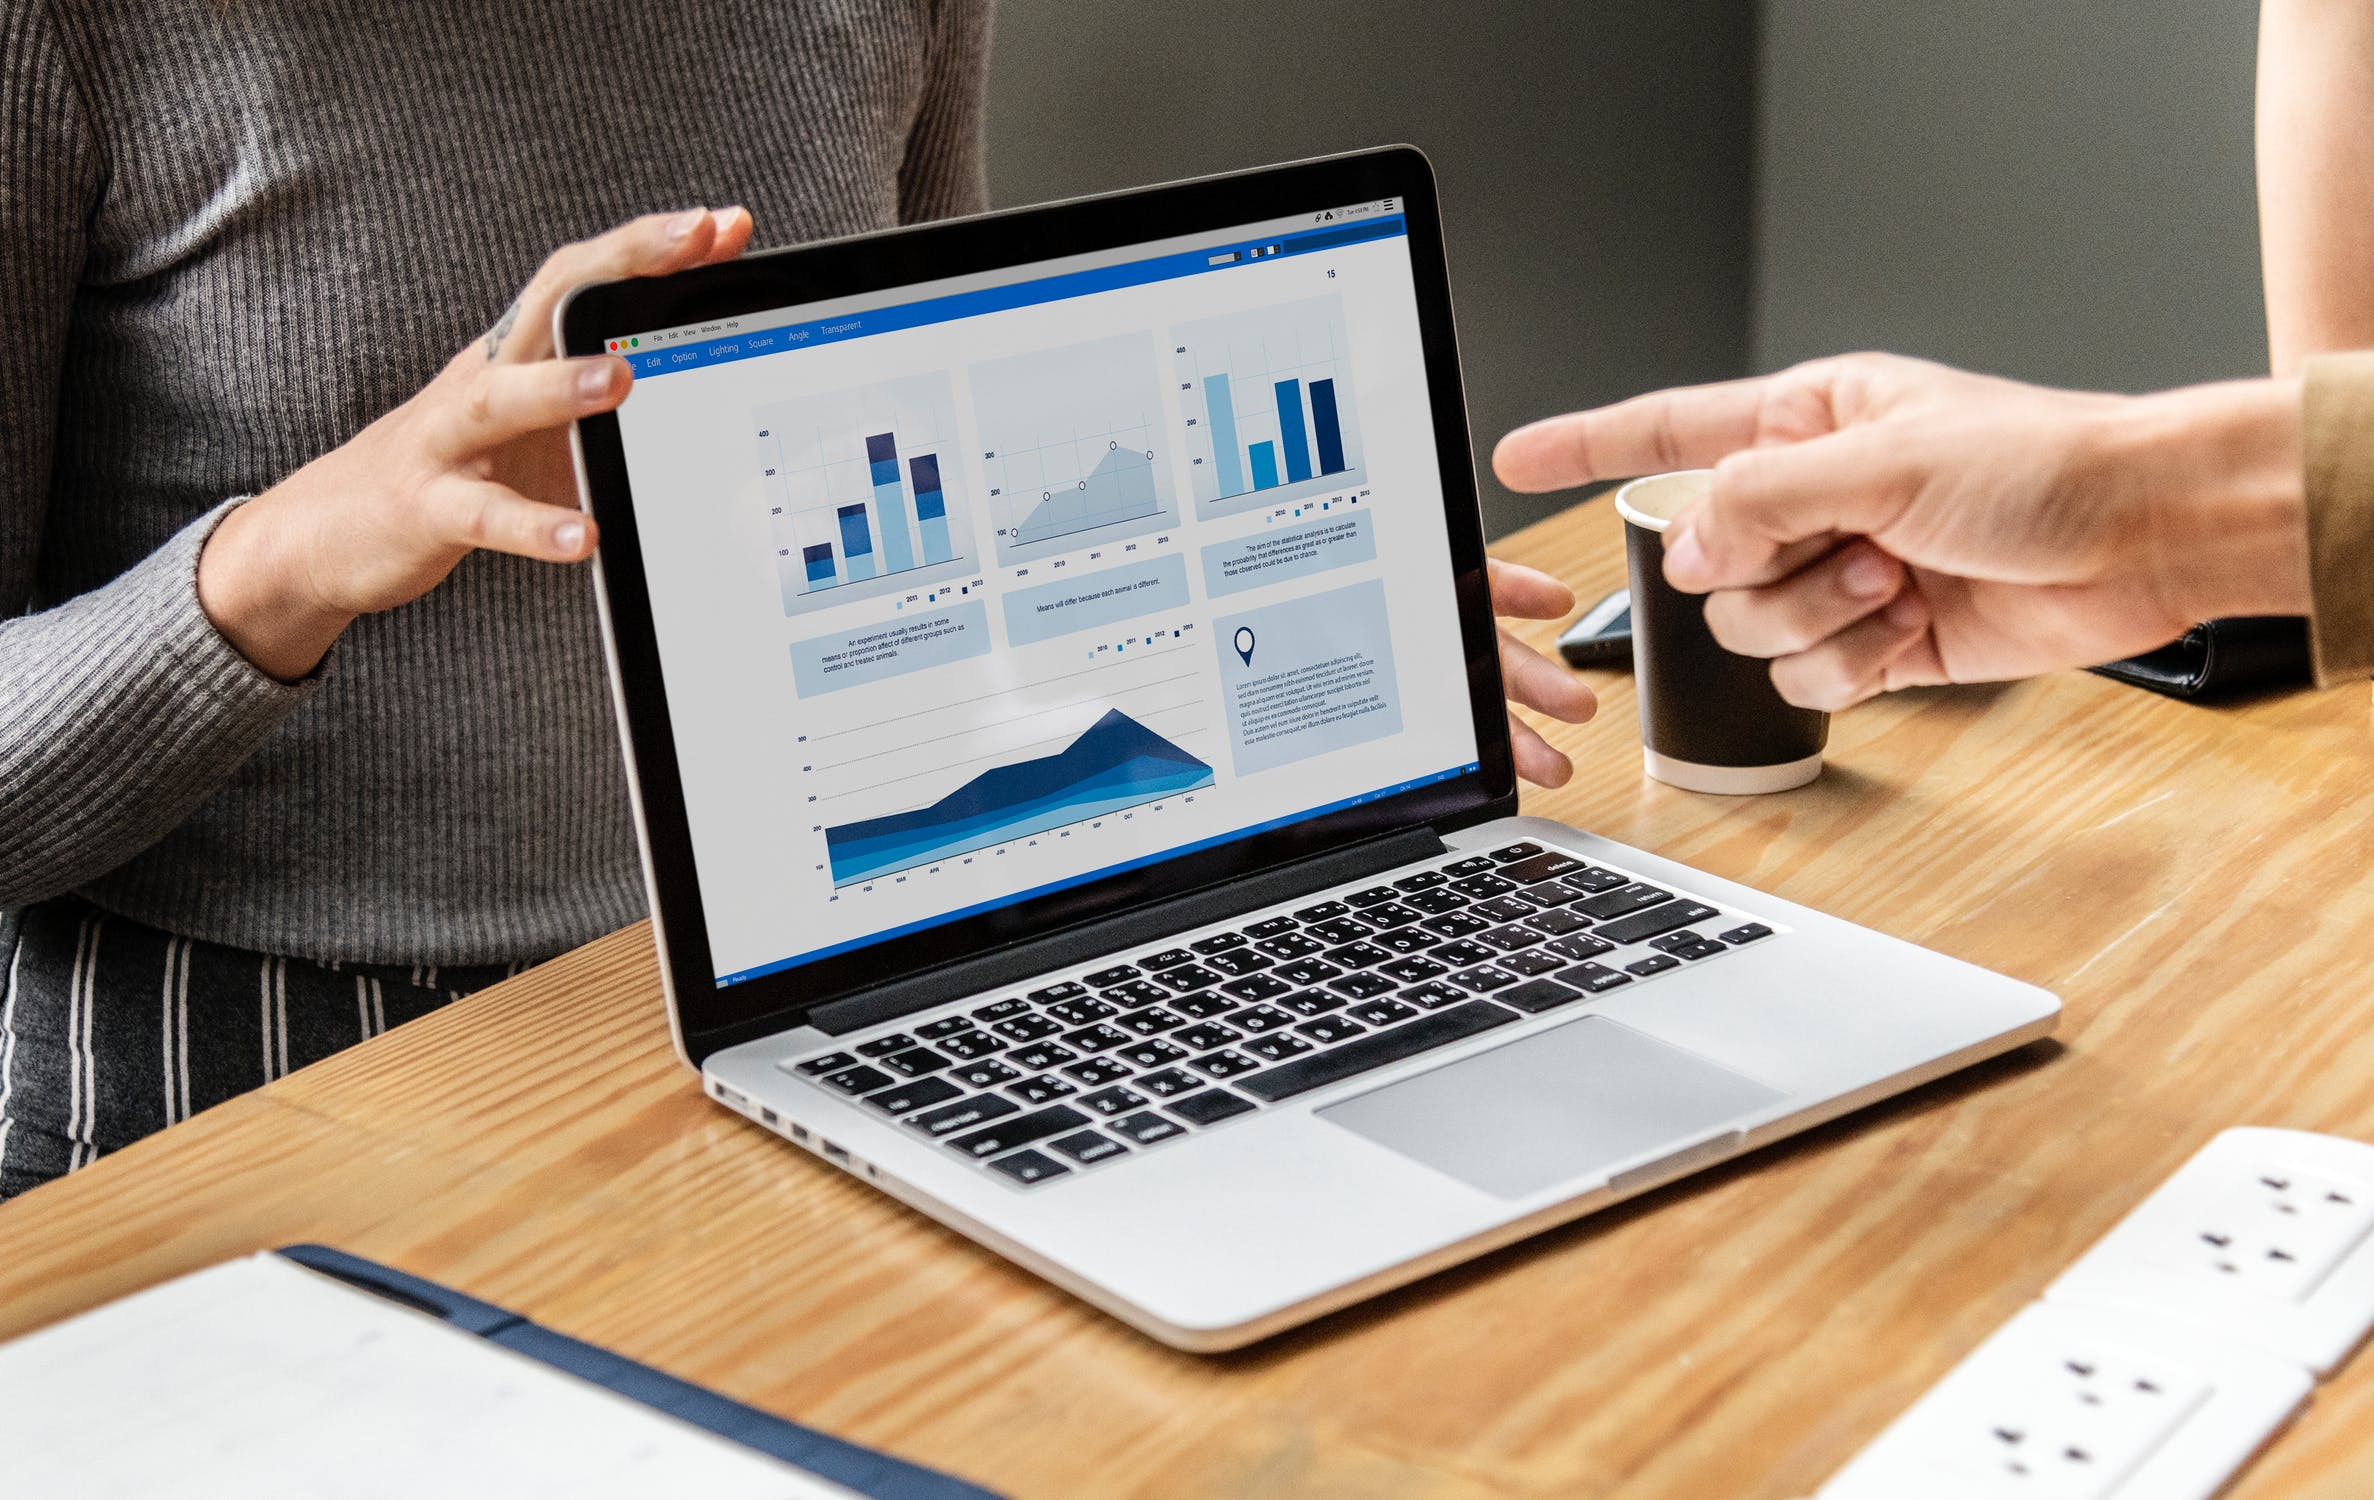 動画広告の効果測定方法